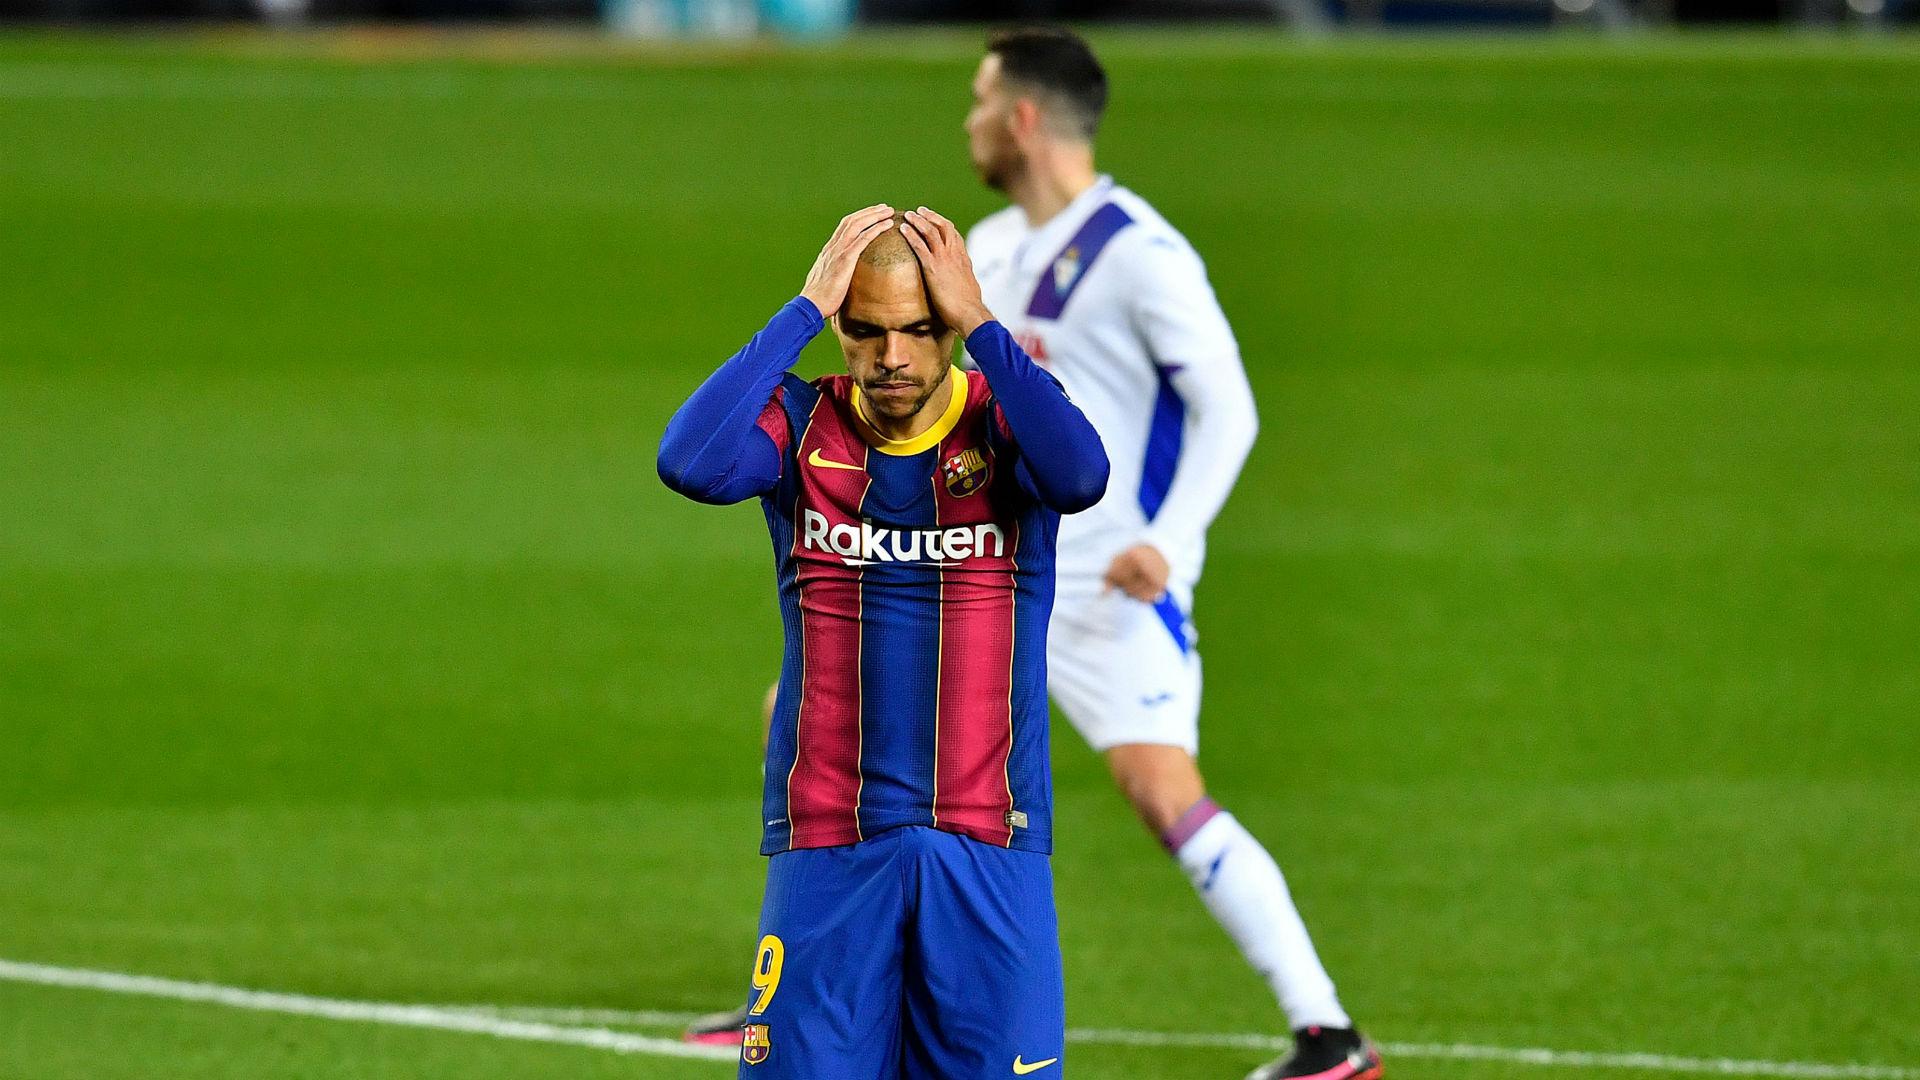 Barcelona 1-1 Eibar: Koeman's men struggle without Messi